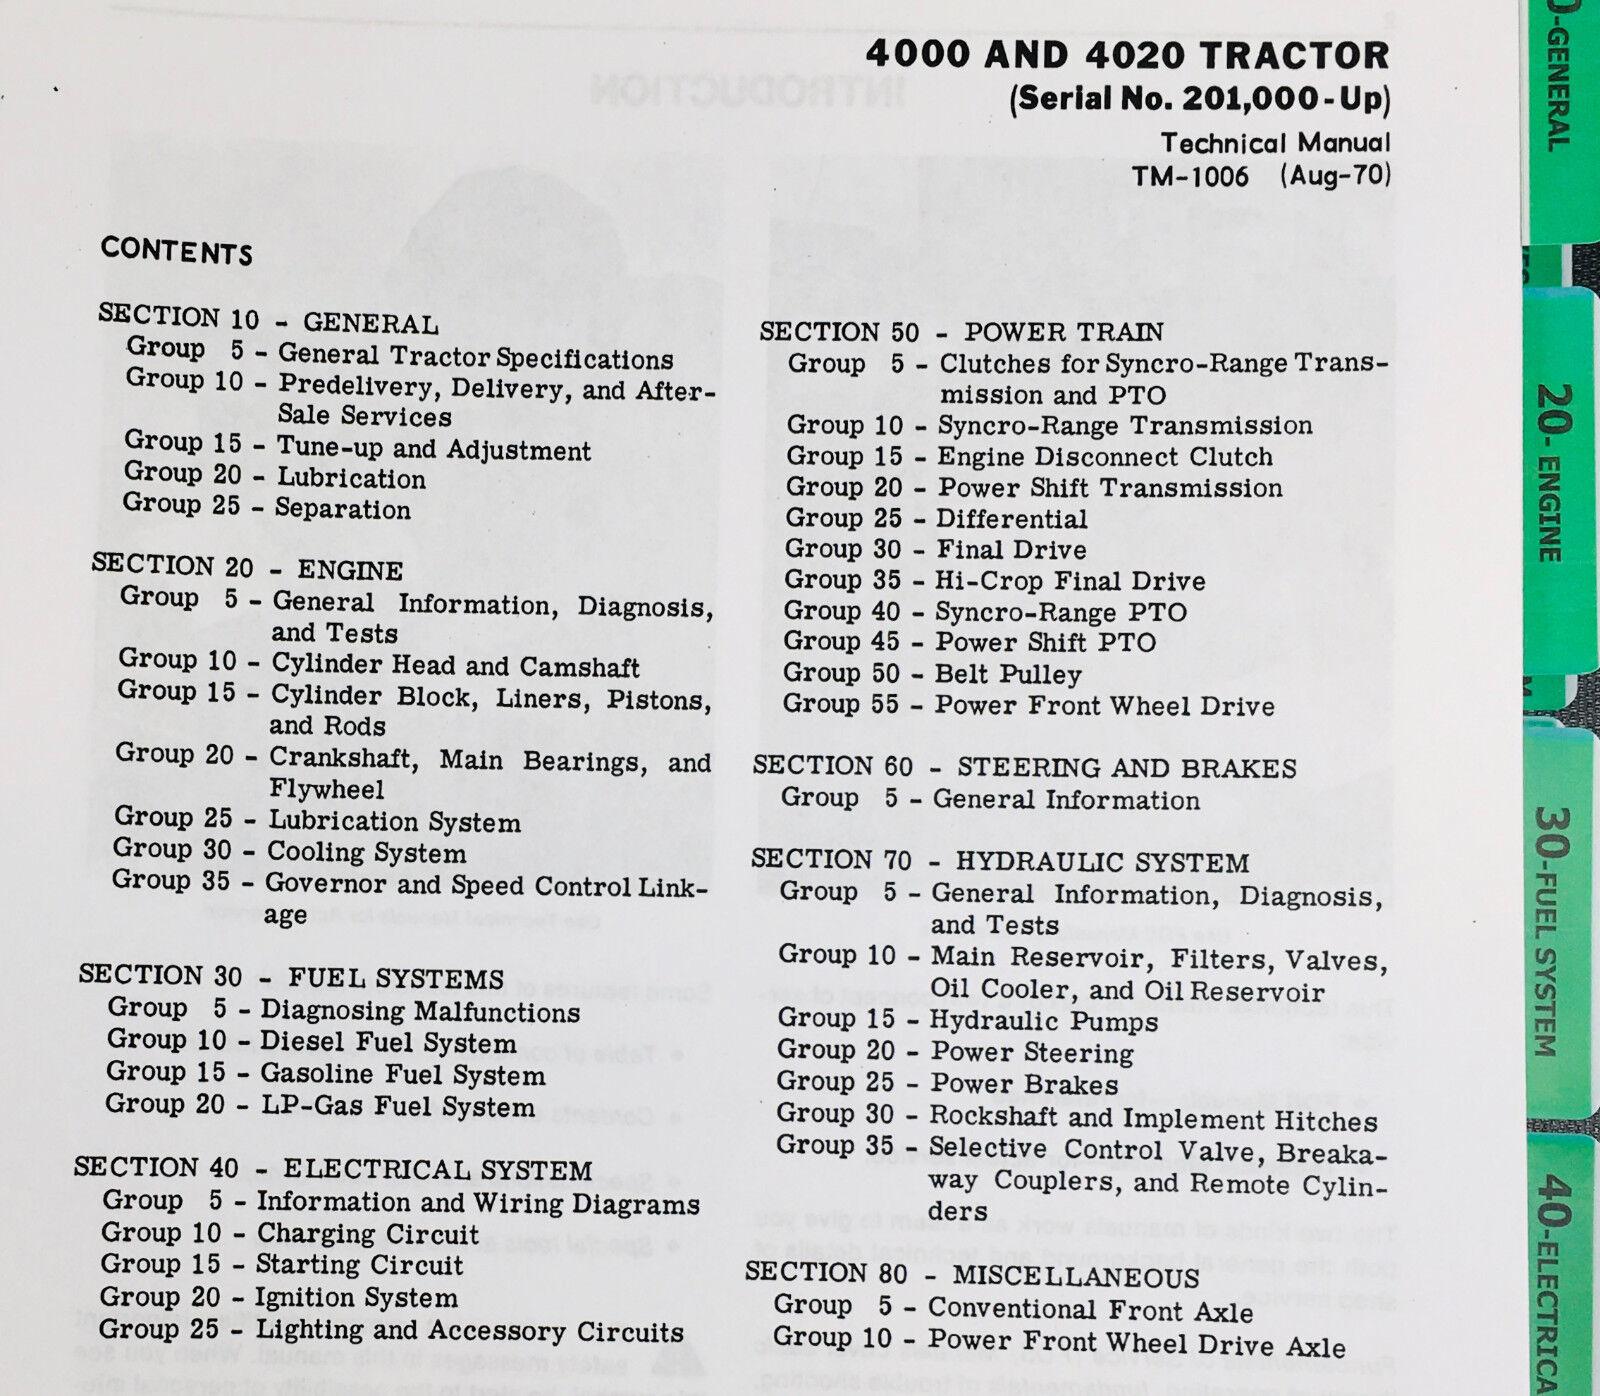 medium resolution of this service manual